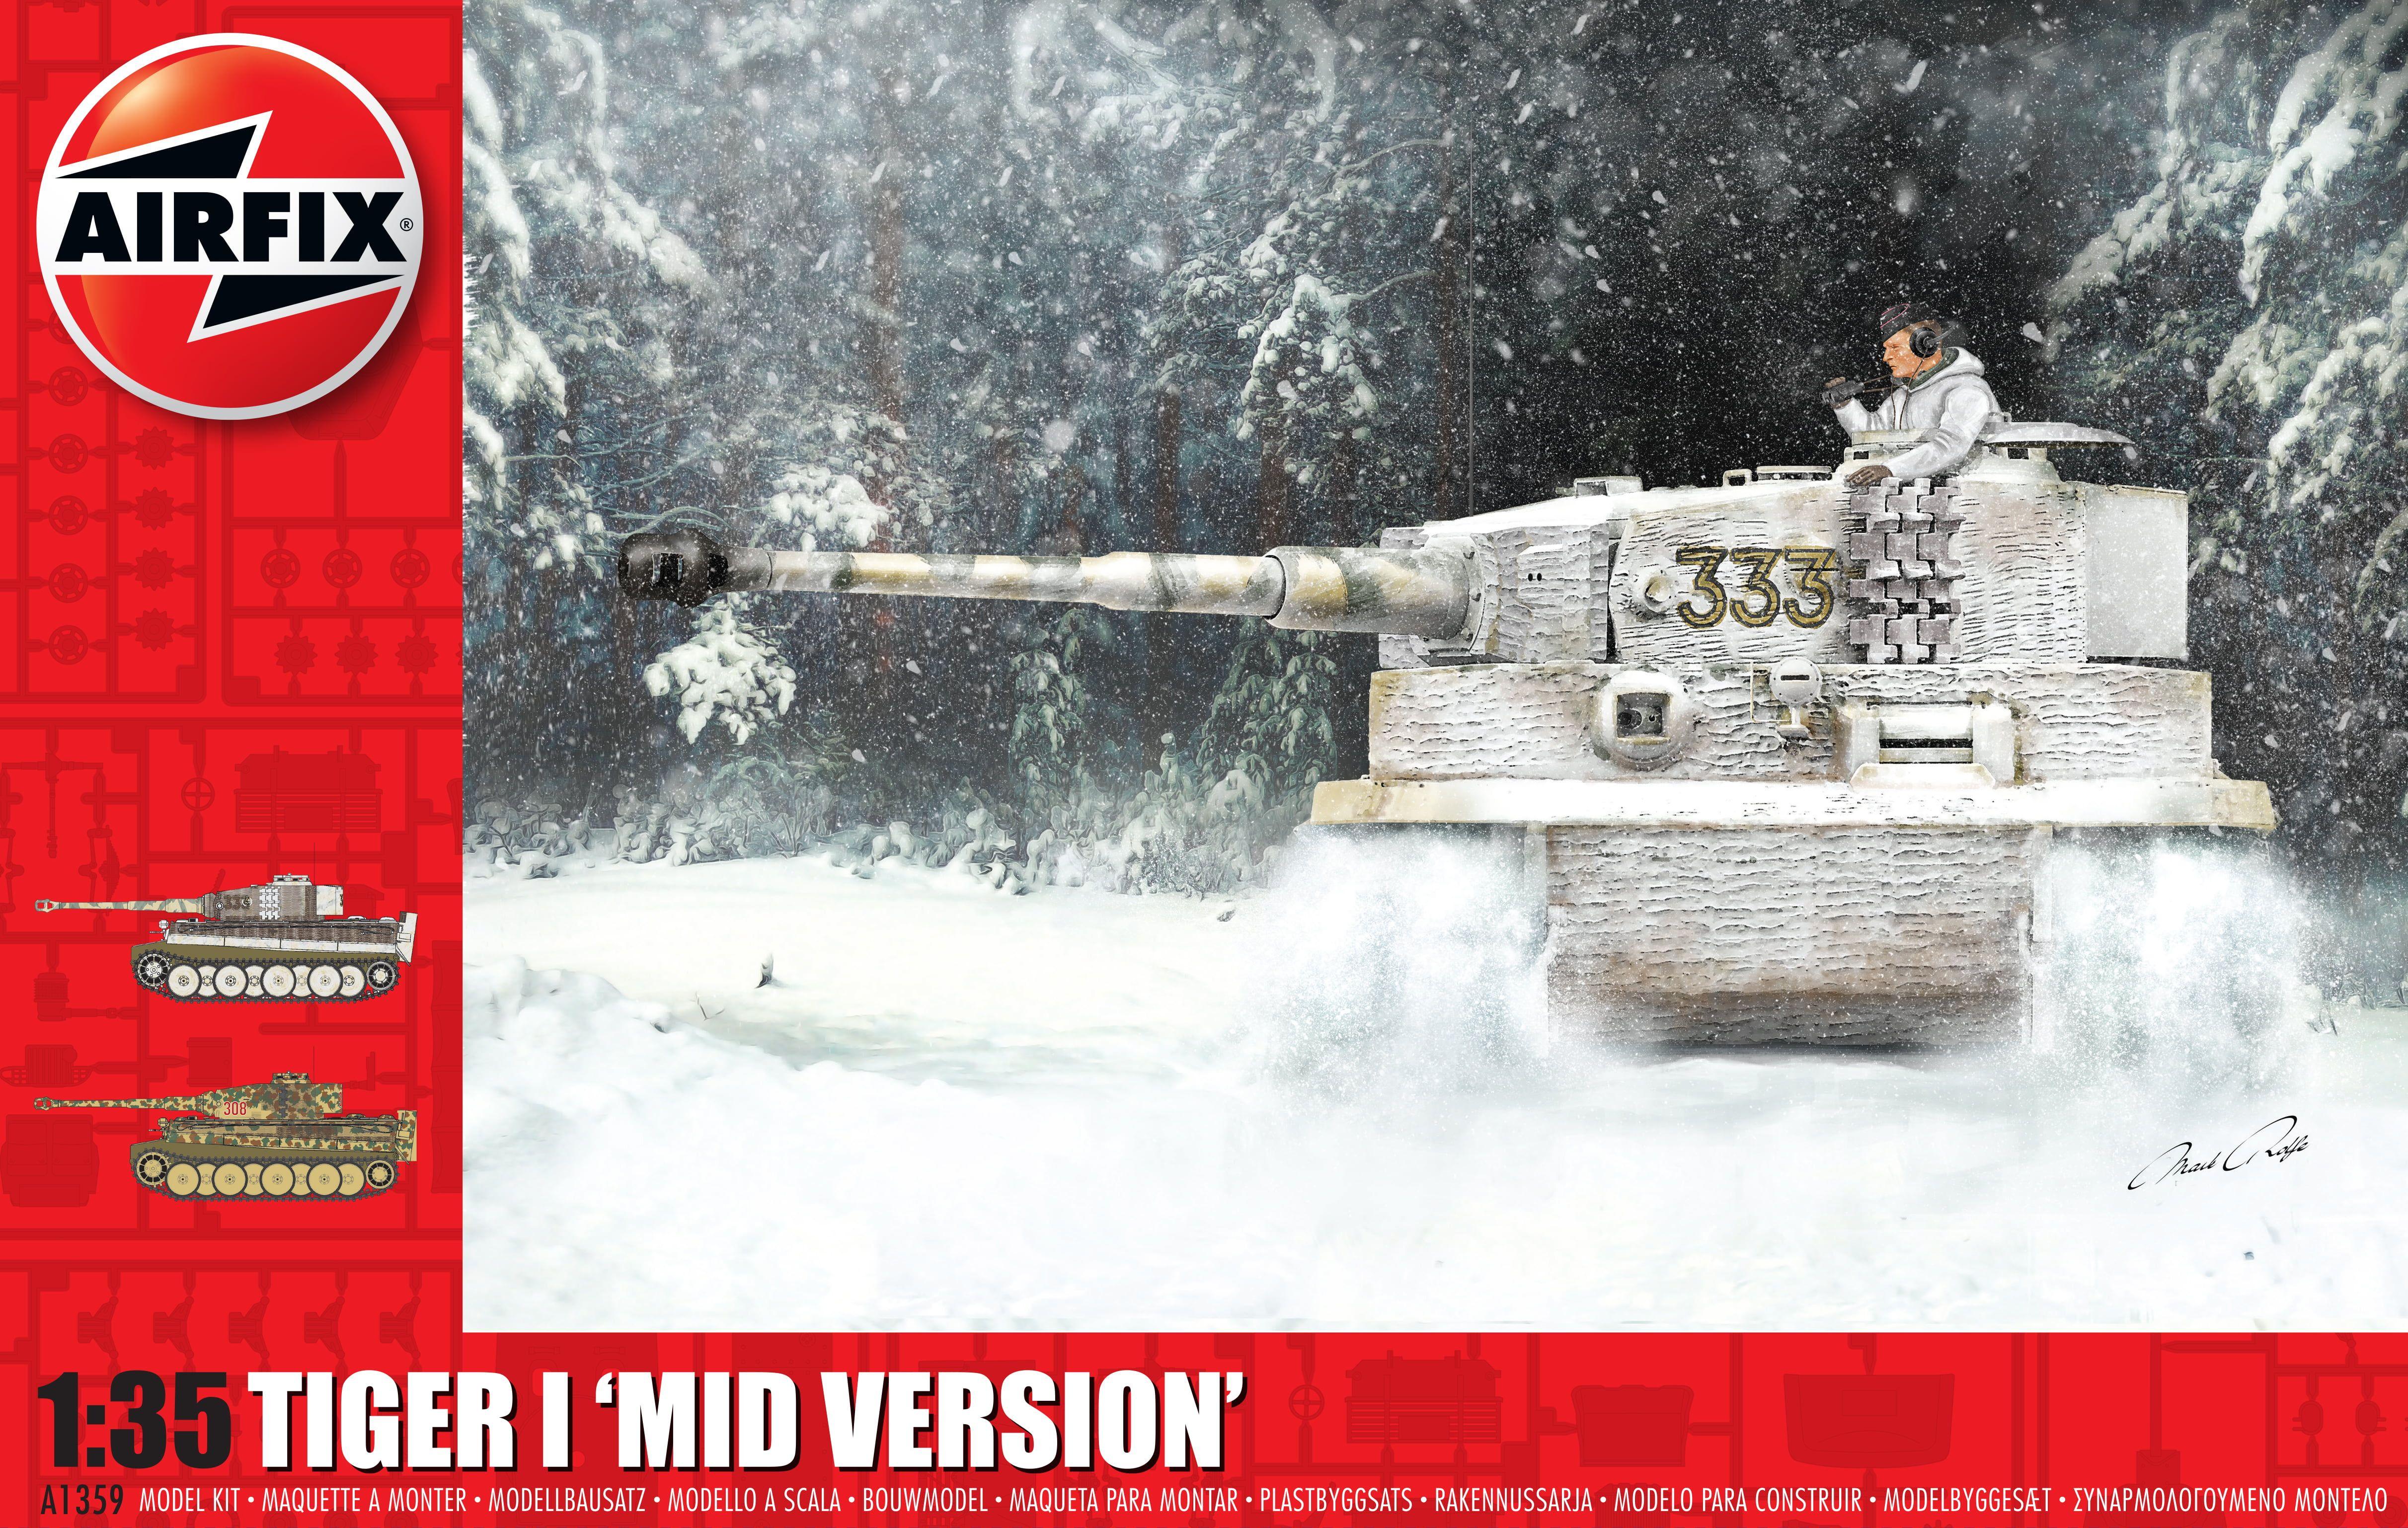 "Airfix Tiger-1 ""Mid Version"" 1:35 Scale Plastic Model Kit"